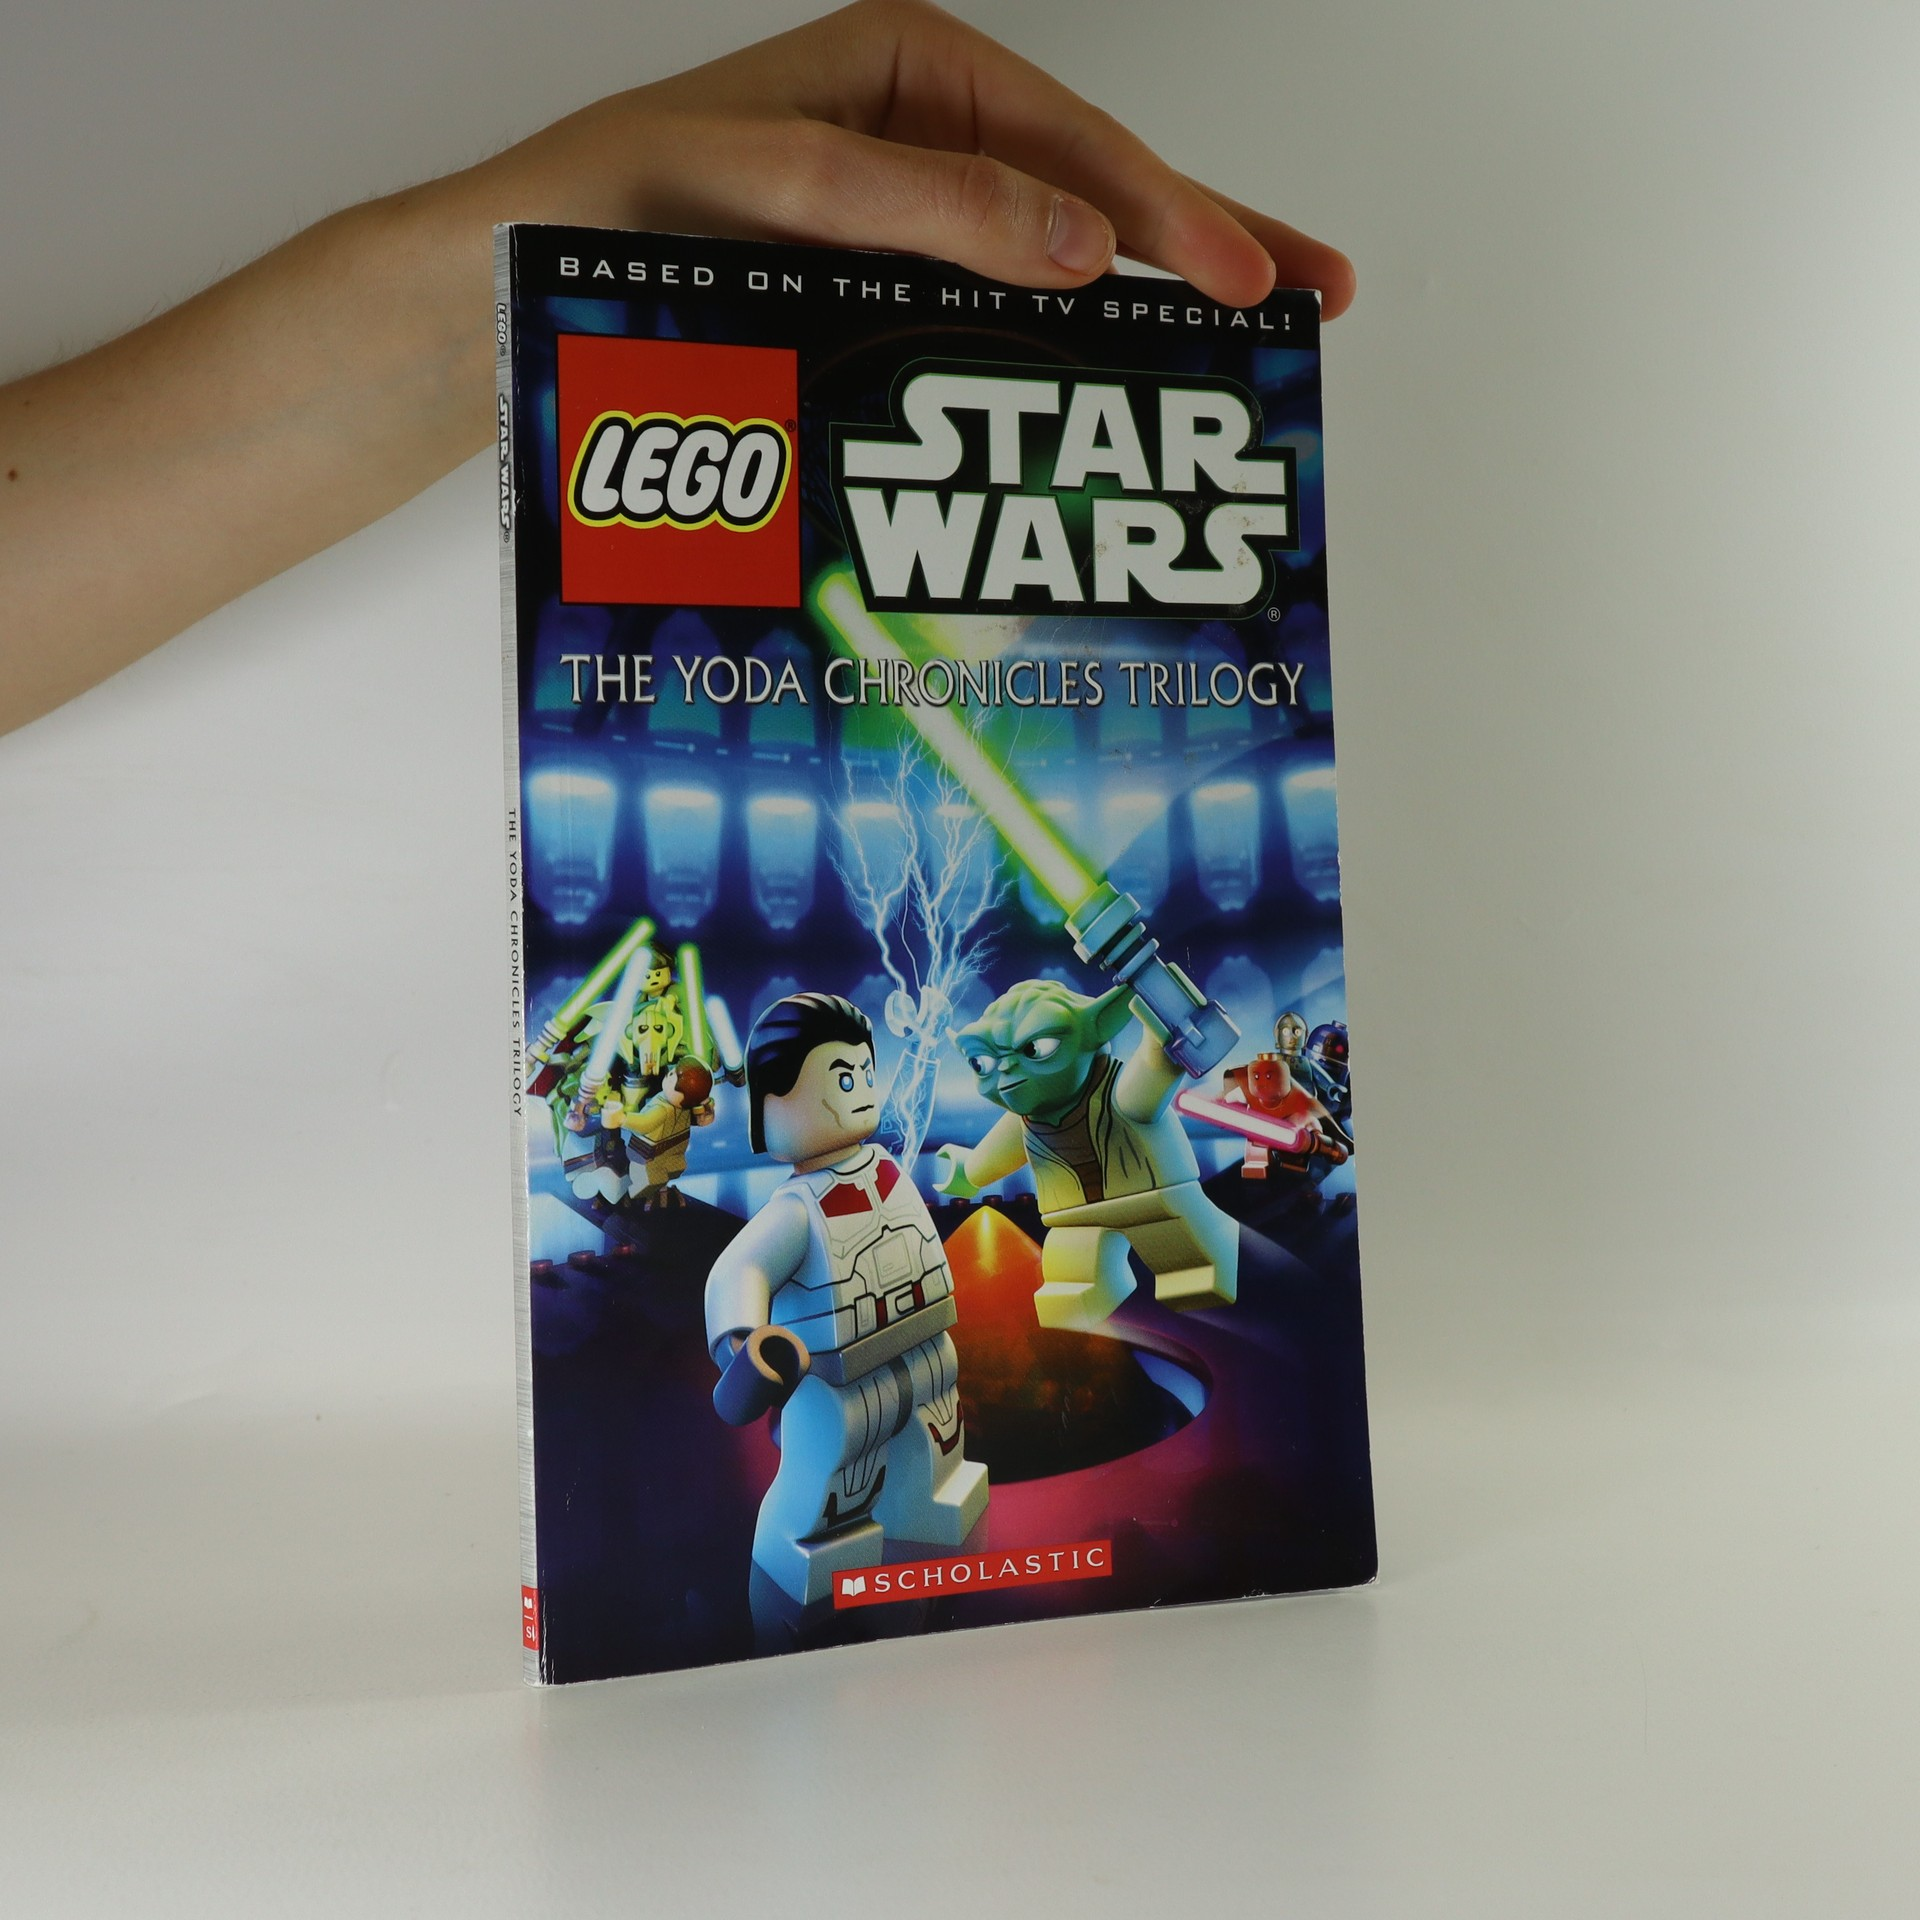 antikvární kniha The Yoda Chronicles Trilogy, 2014